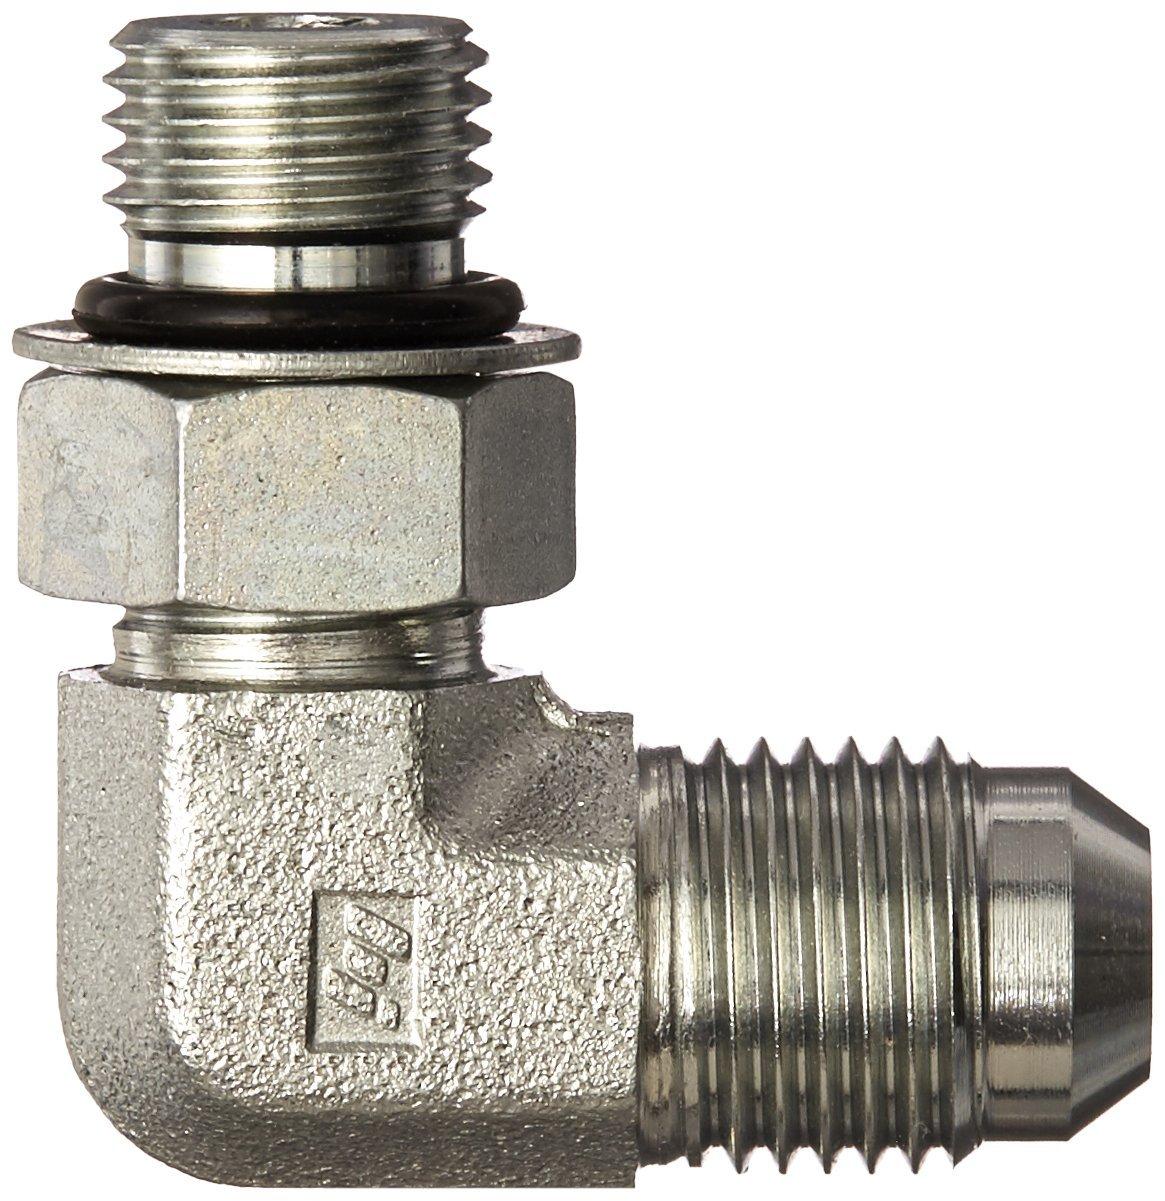 3//4 Tube OD JIC Male x 1-5//16-12 Male Straight Thread O-Ring Boss Brennan 6801-12-16-NWO-FG Forged Steel JIC Flared Tube Fitting 90 Degree Elbow